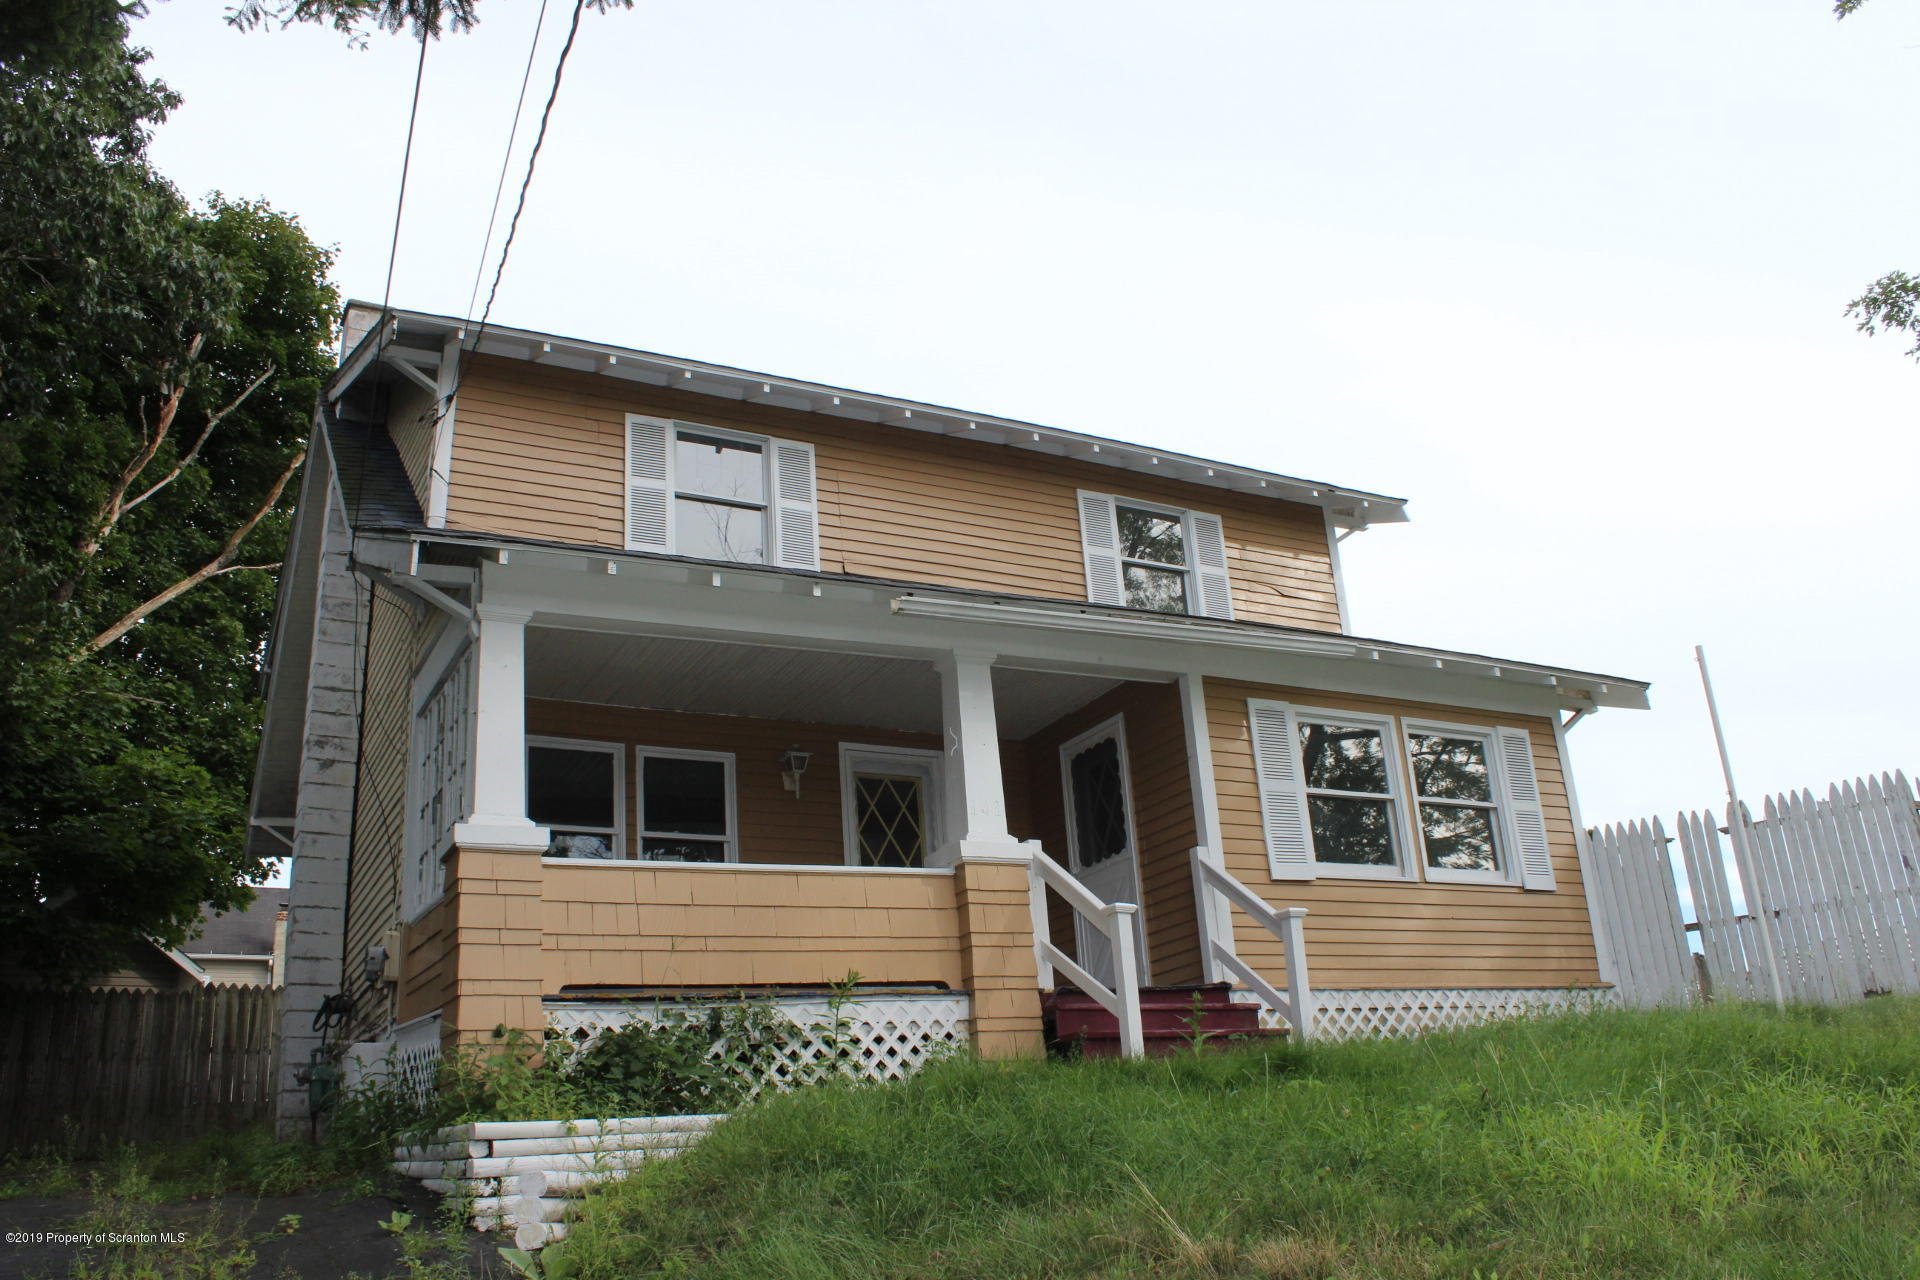 141 Spruce St, Archbald, Pennsylvania 18403, 4 Bedrooms Bedrooms, 8 Rooms Rooms,2 BathroomsBathrooms,Single Family,For Sale,Spruce,19-4399